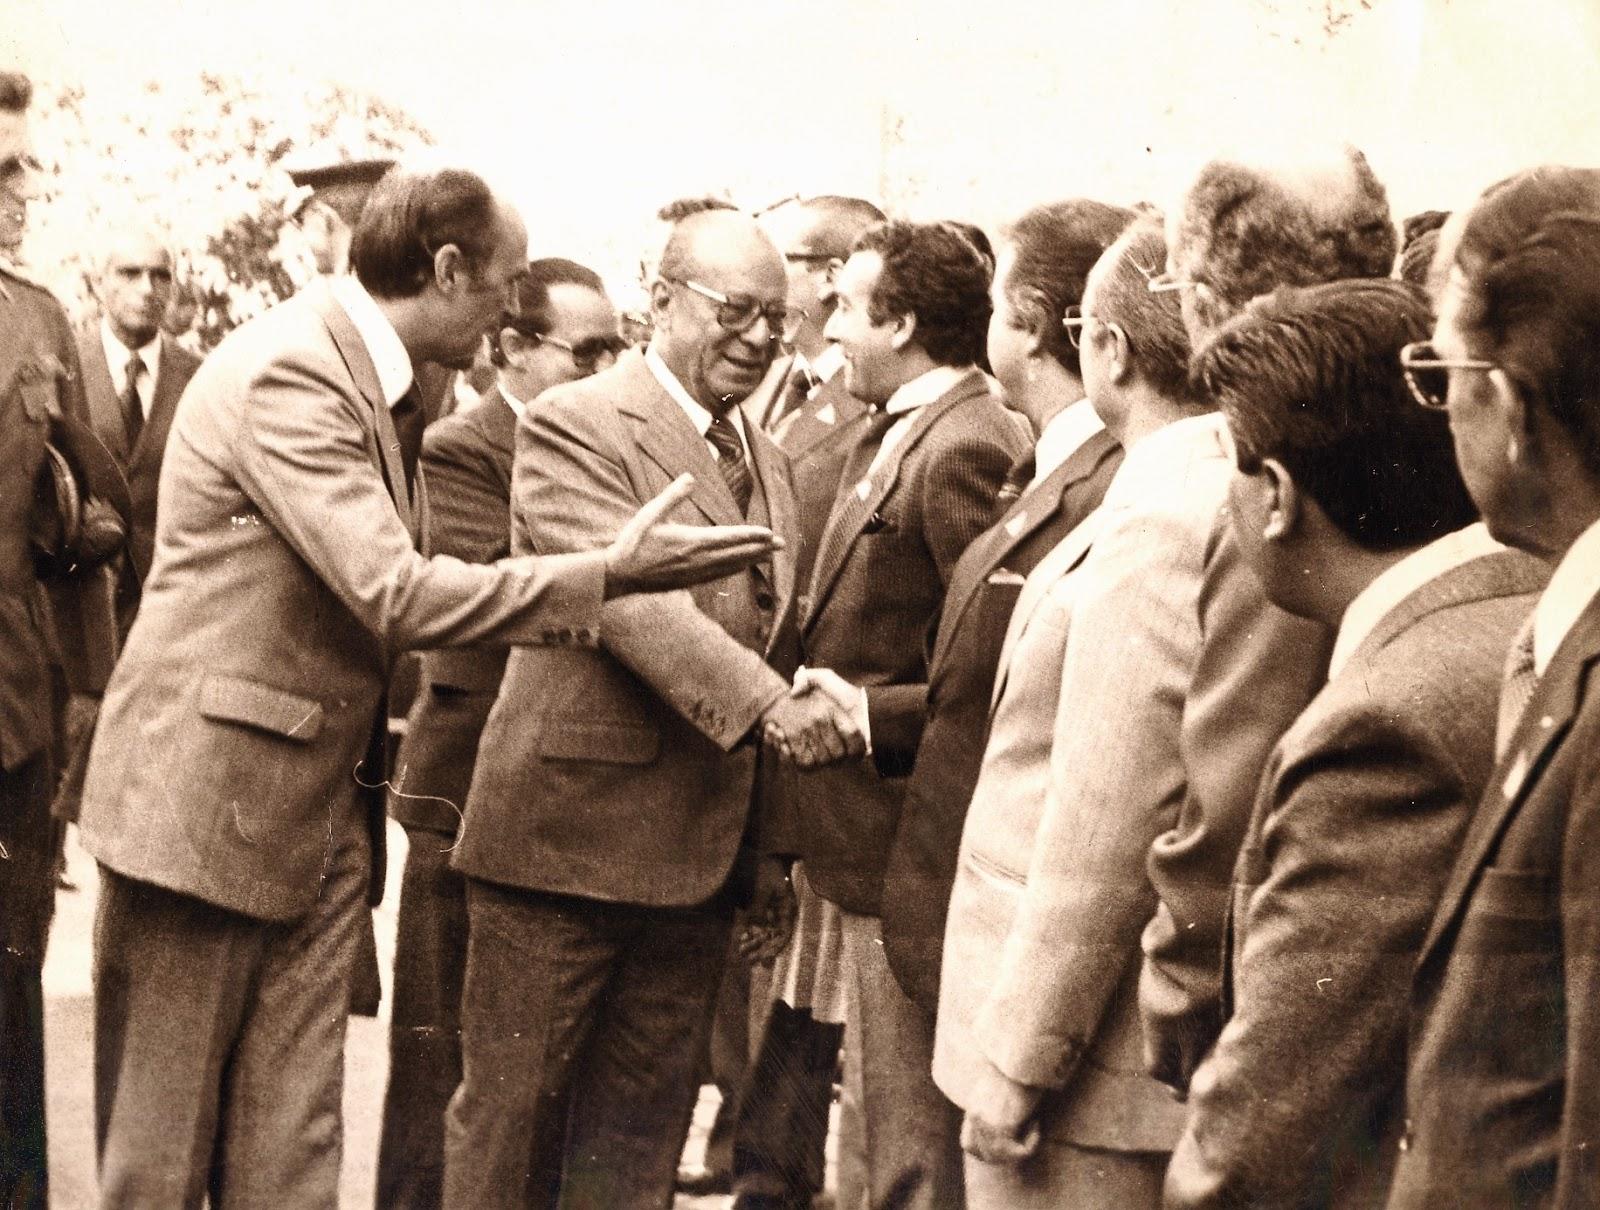 João Figueiredo visita Maringá - 1982